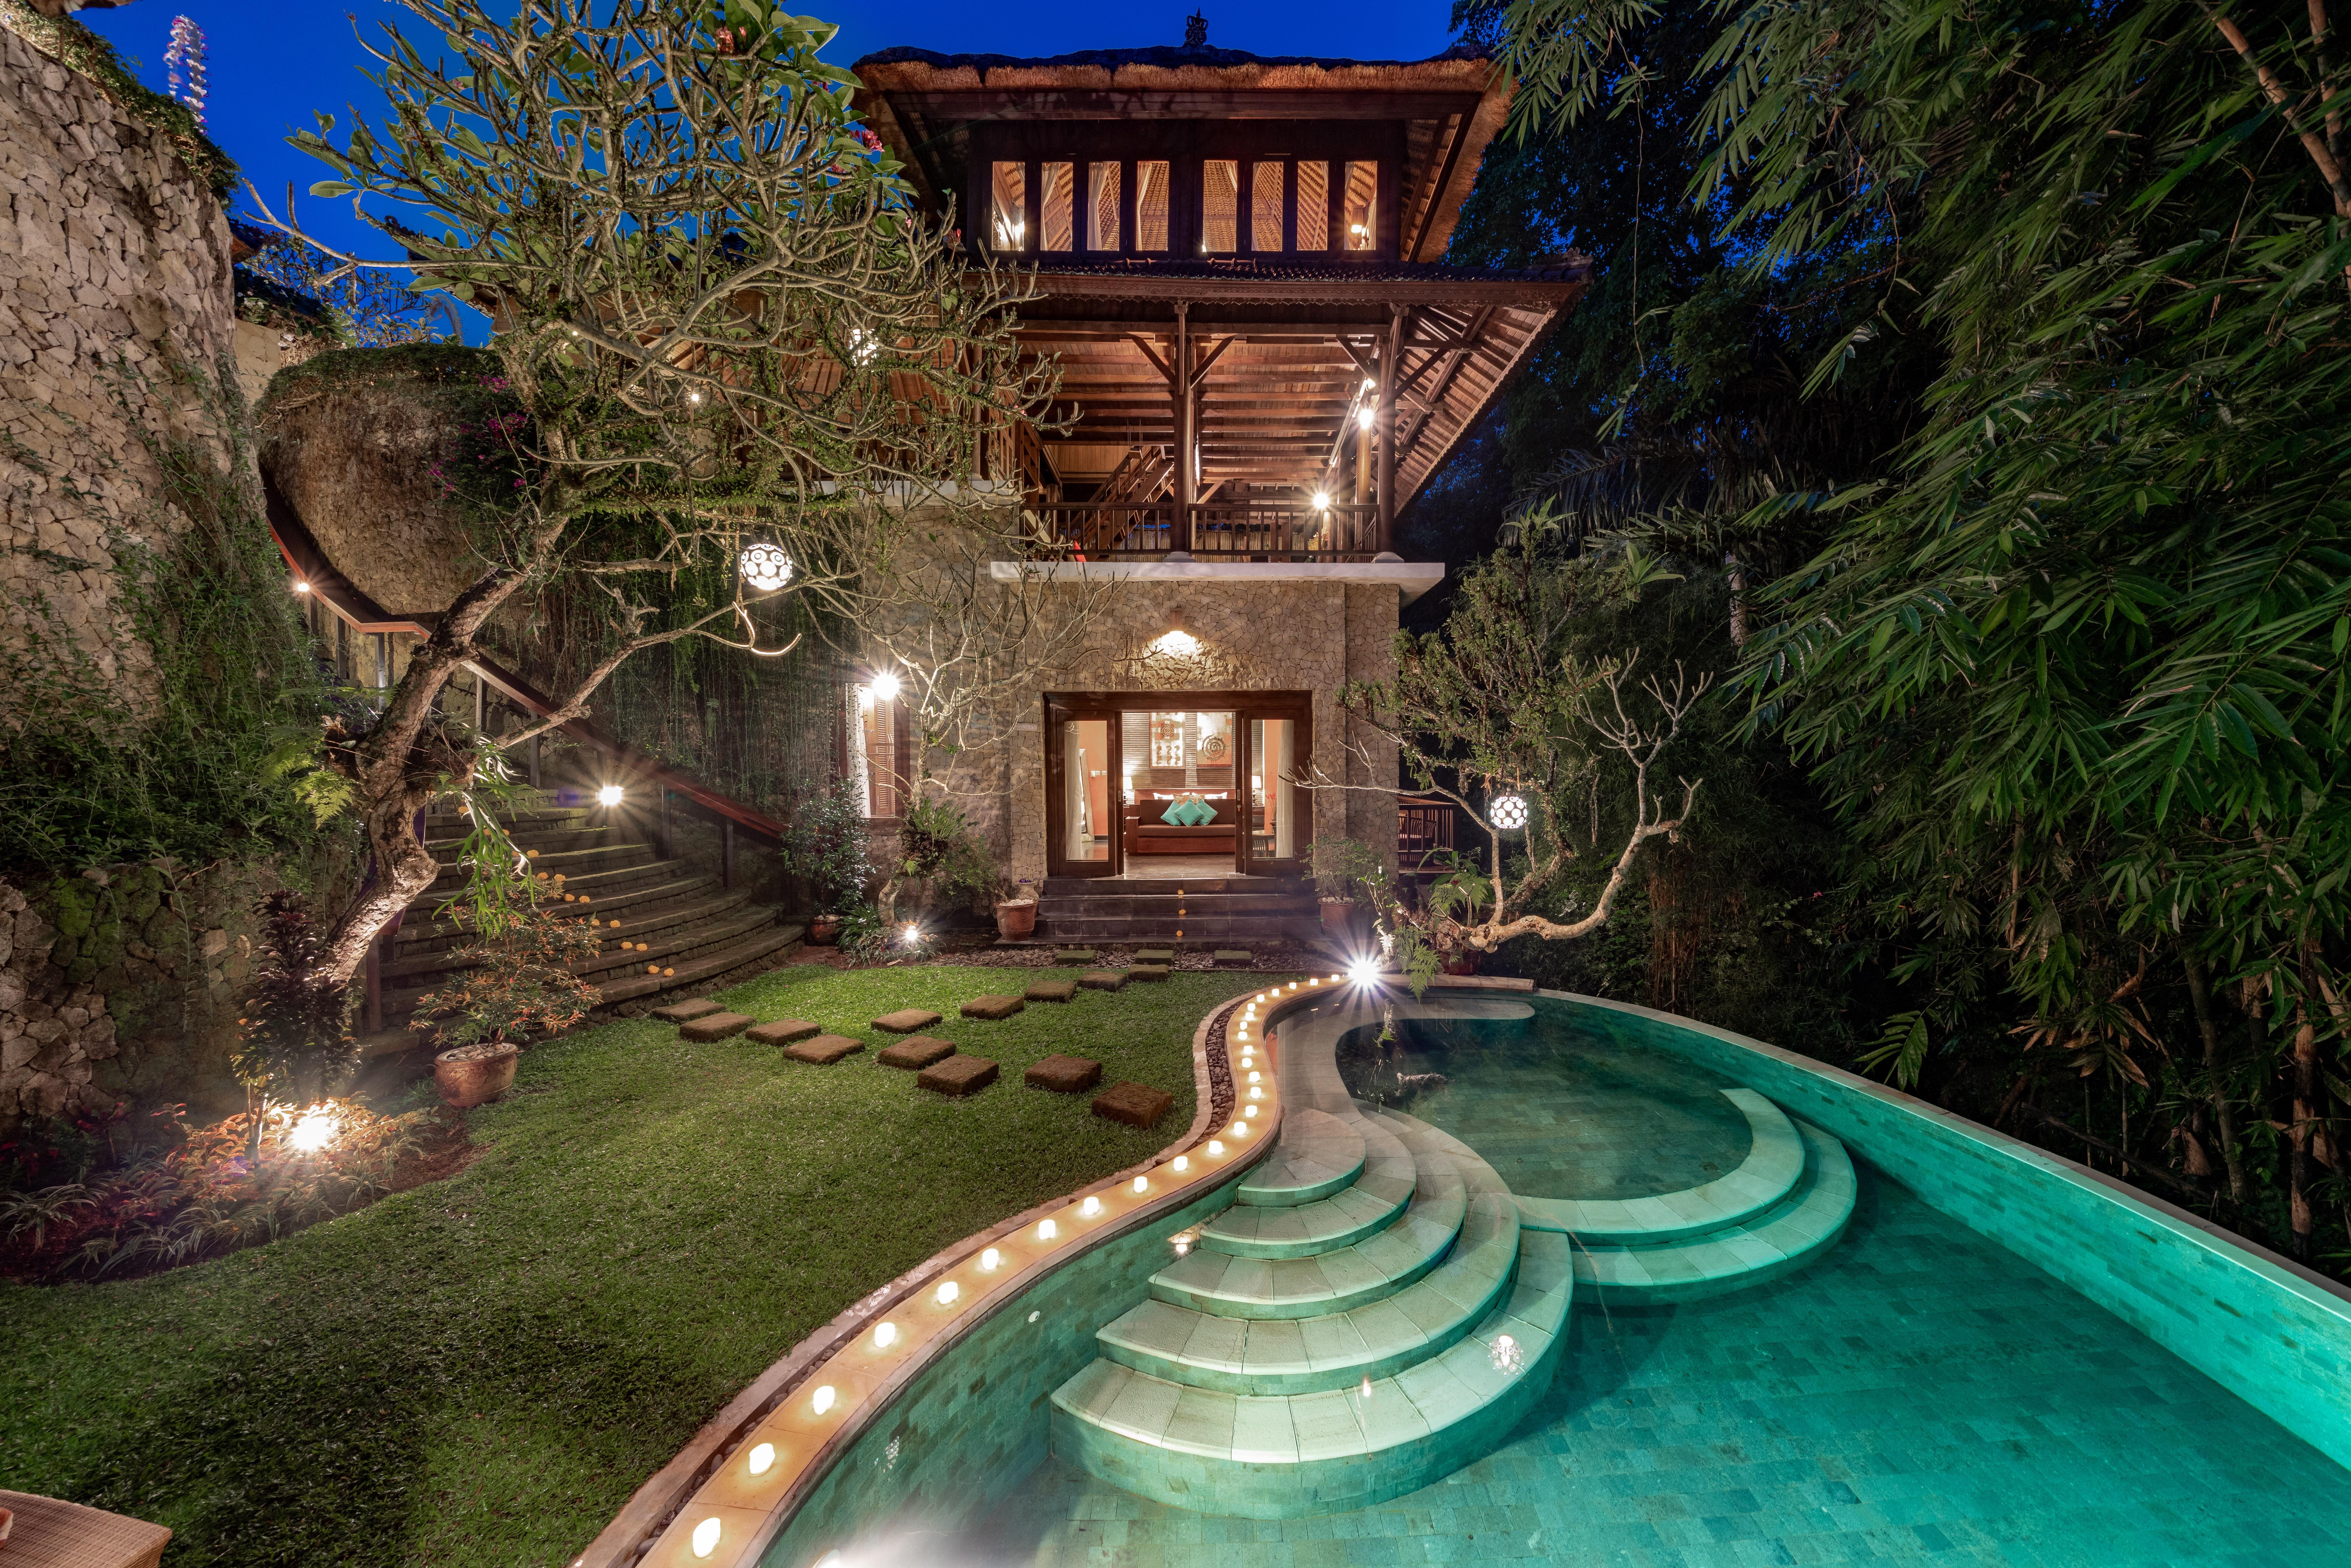 3br Luxury Villa W Pool View In Ubud Center Villas For Rent In Ubud Bali Indonesia